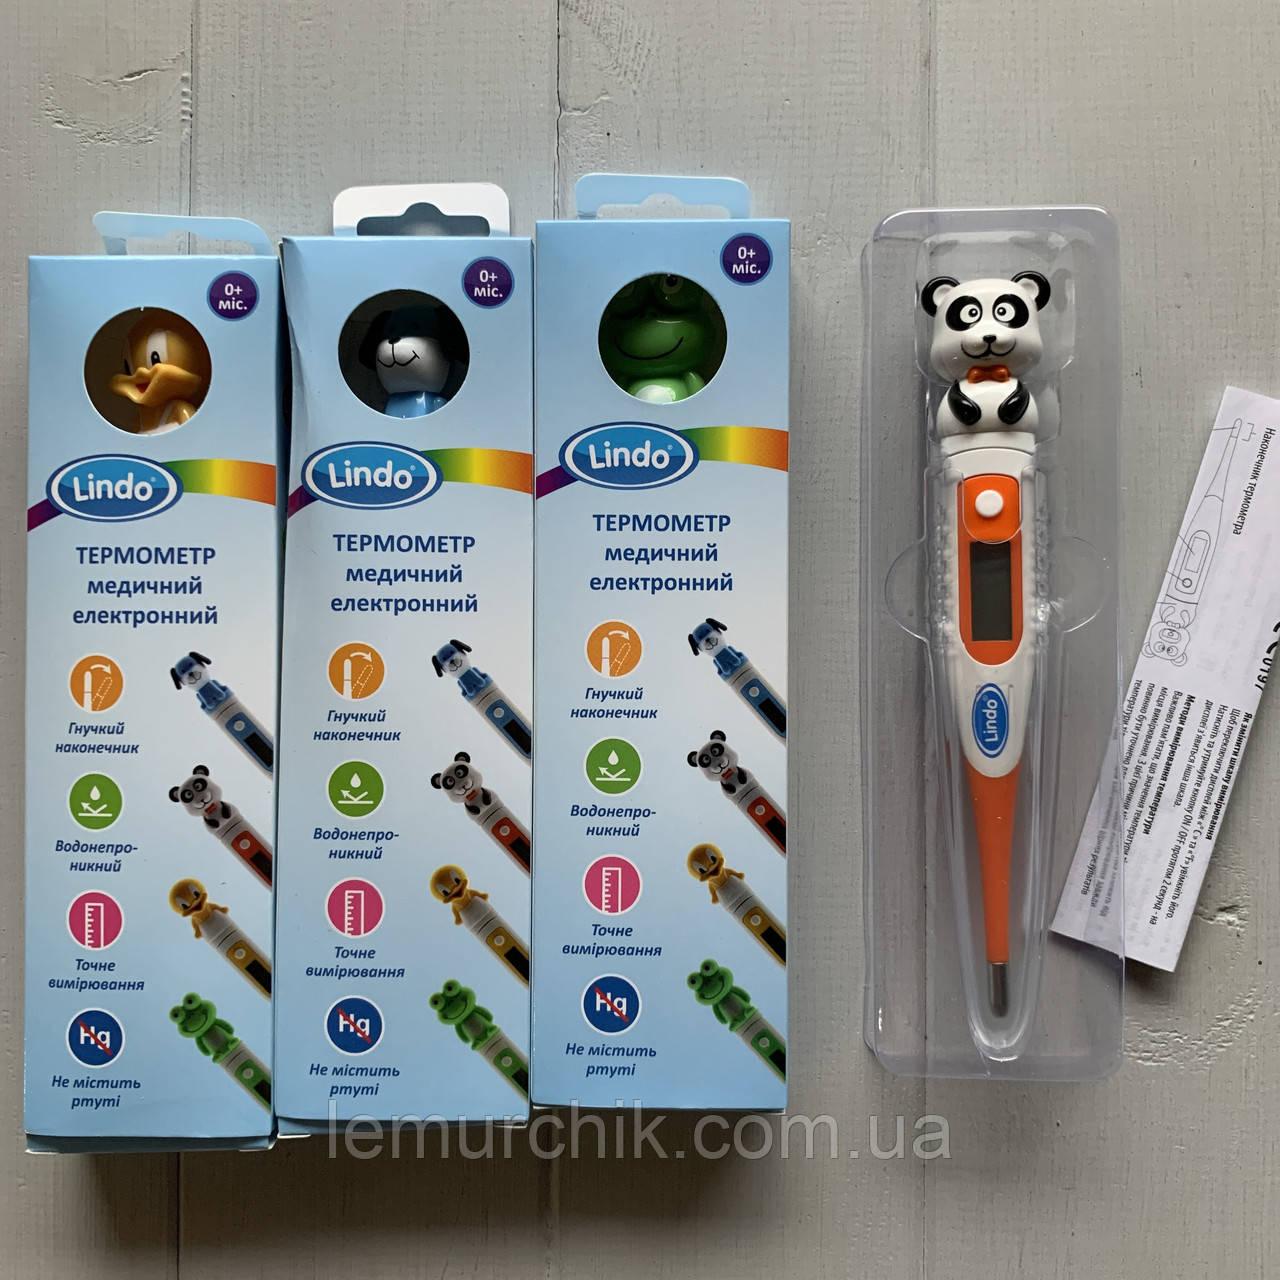 Электронный термометр с гибким носиком Lindo